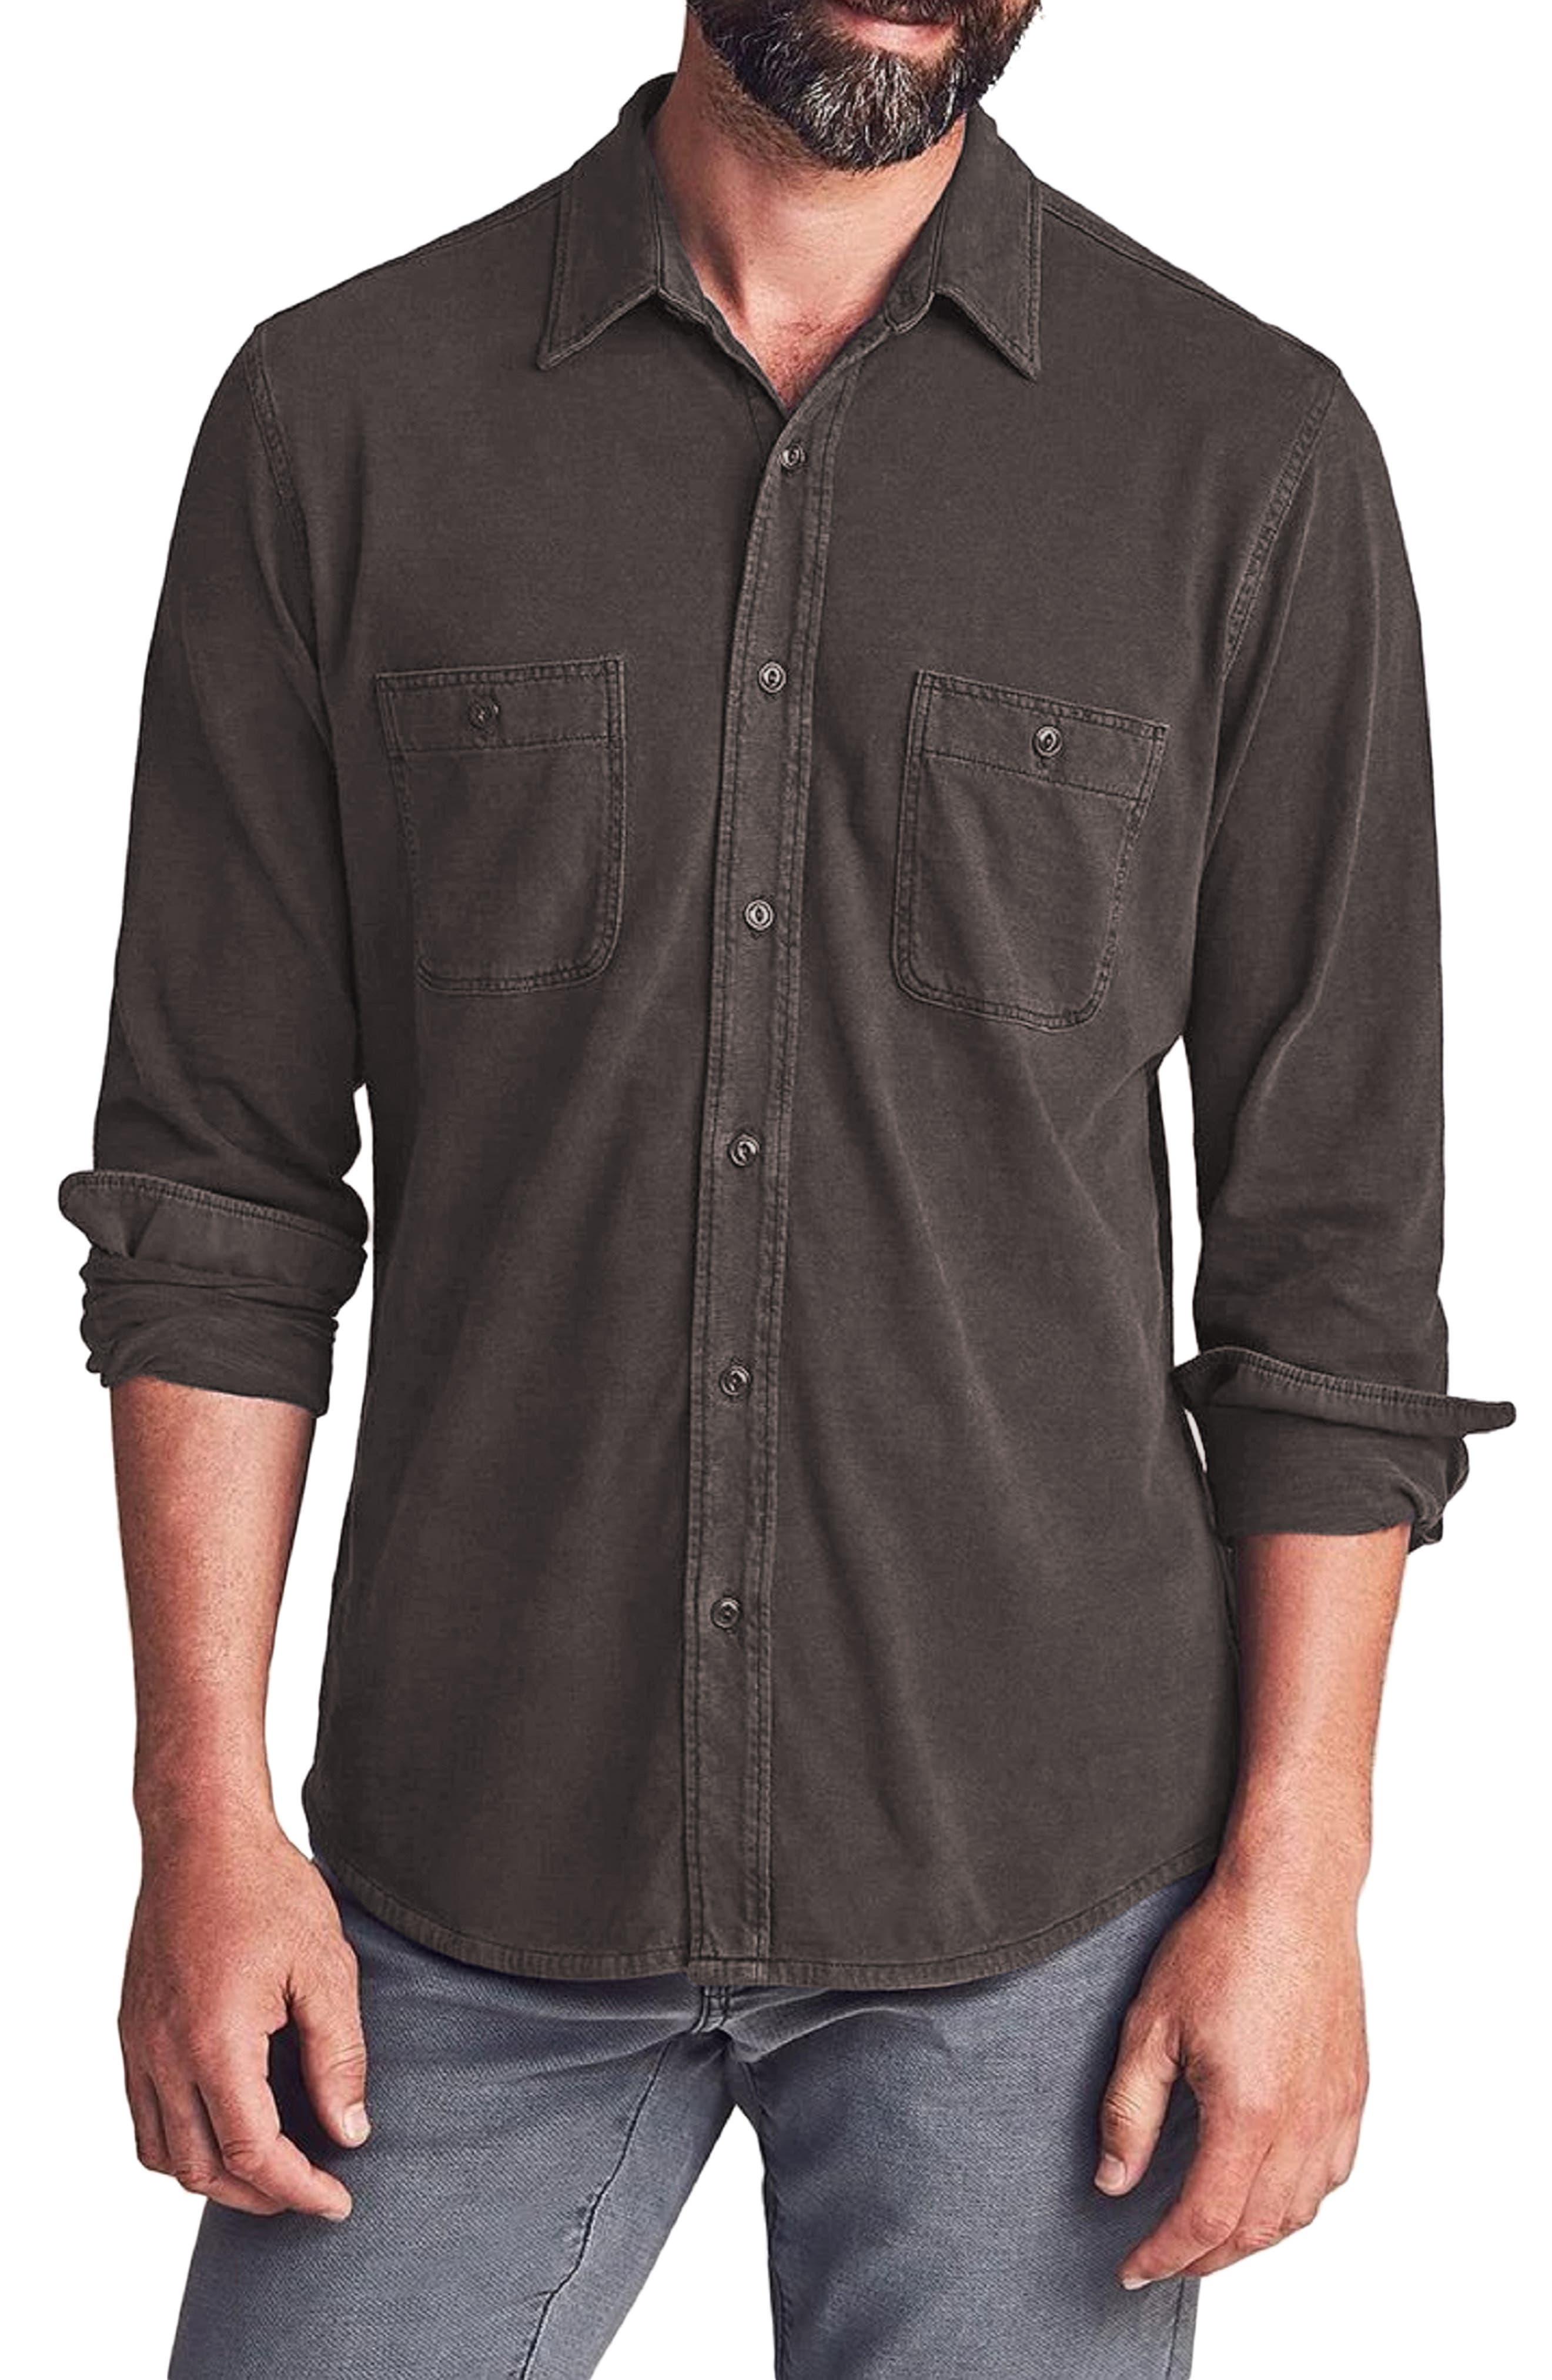 Seasons Knit Button-Up Shirt